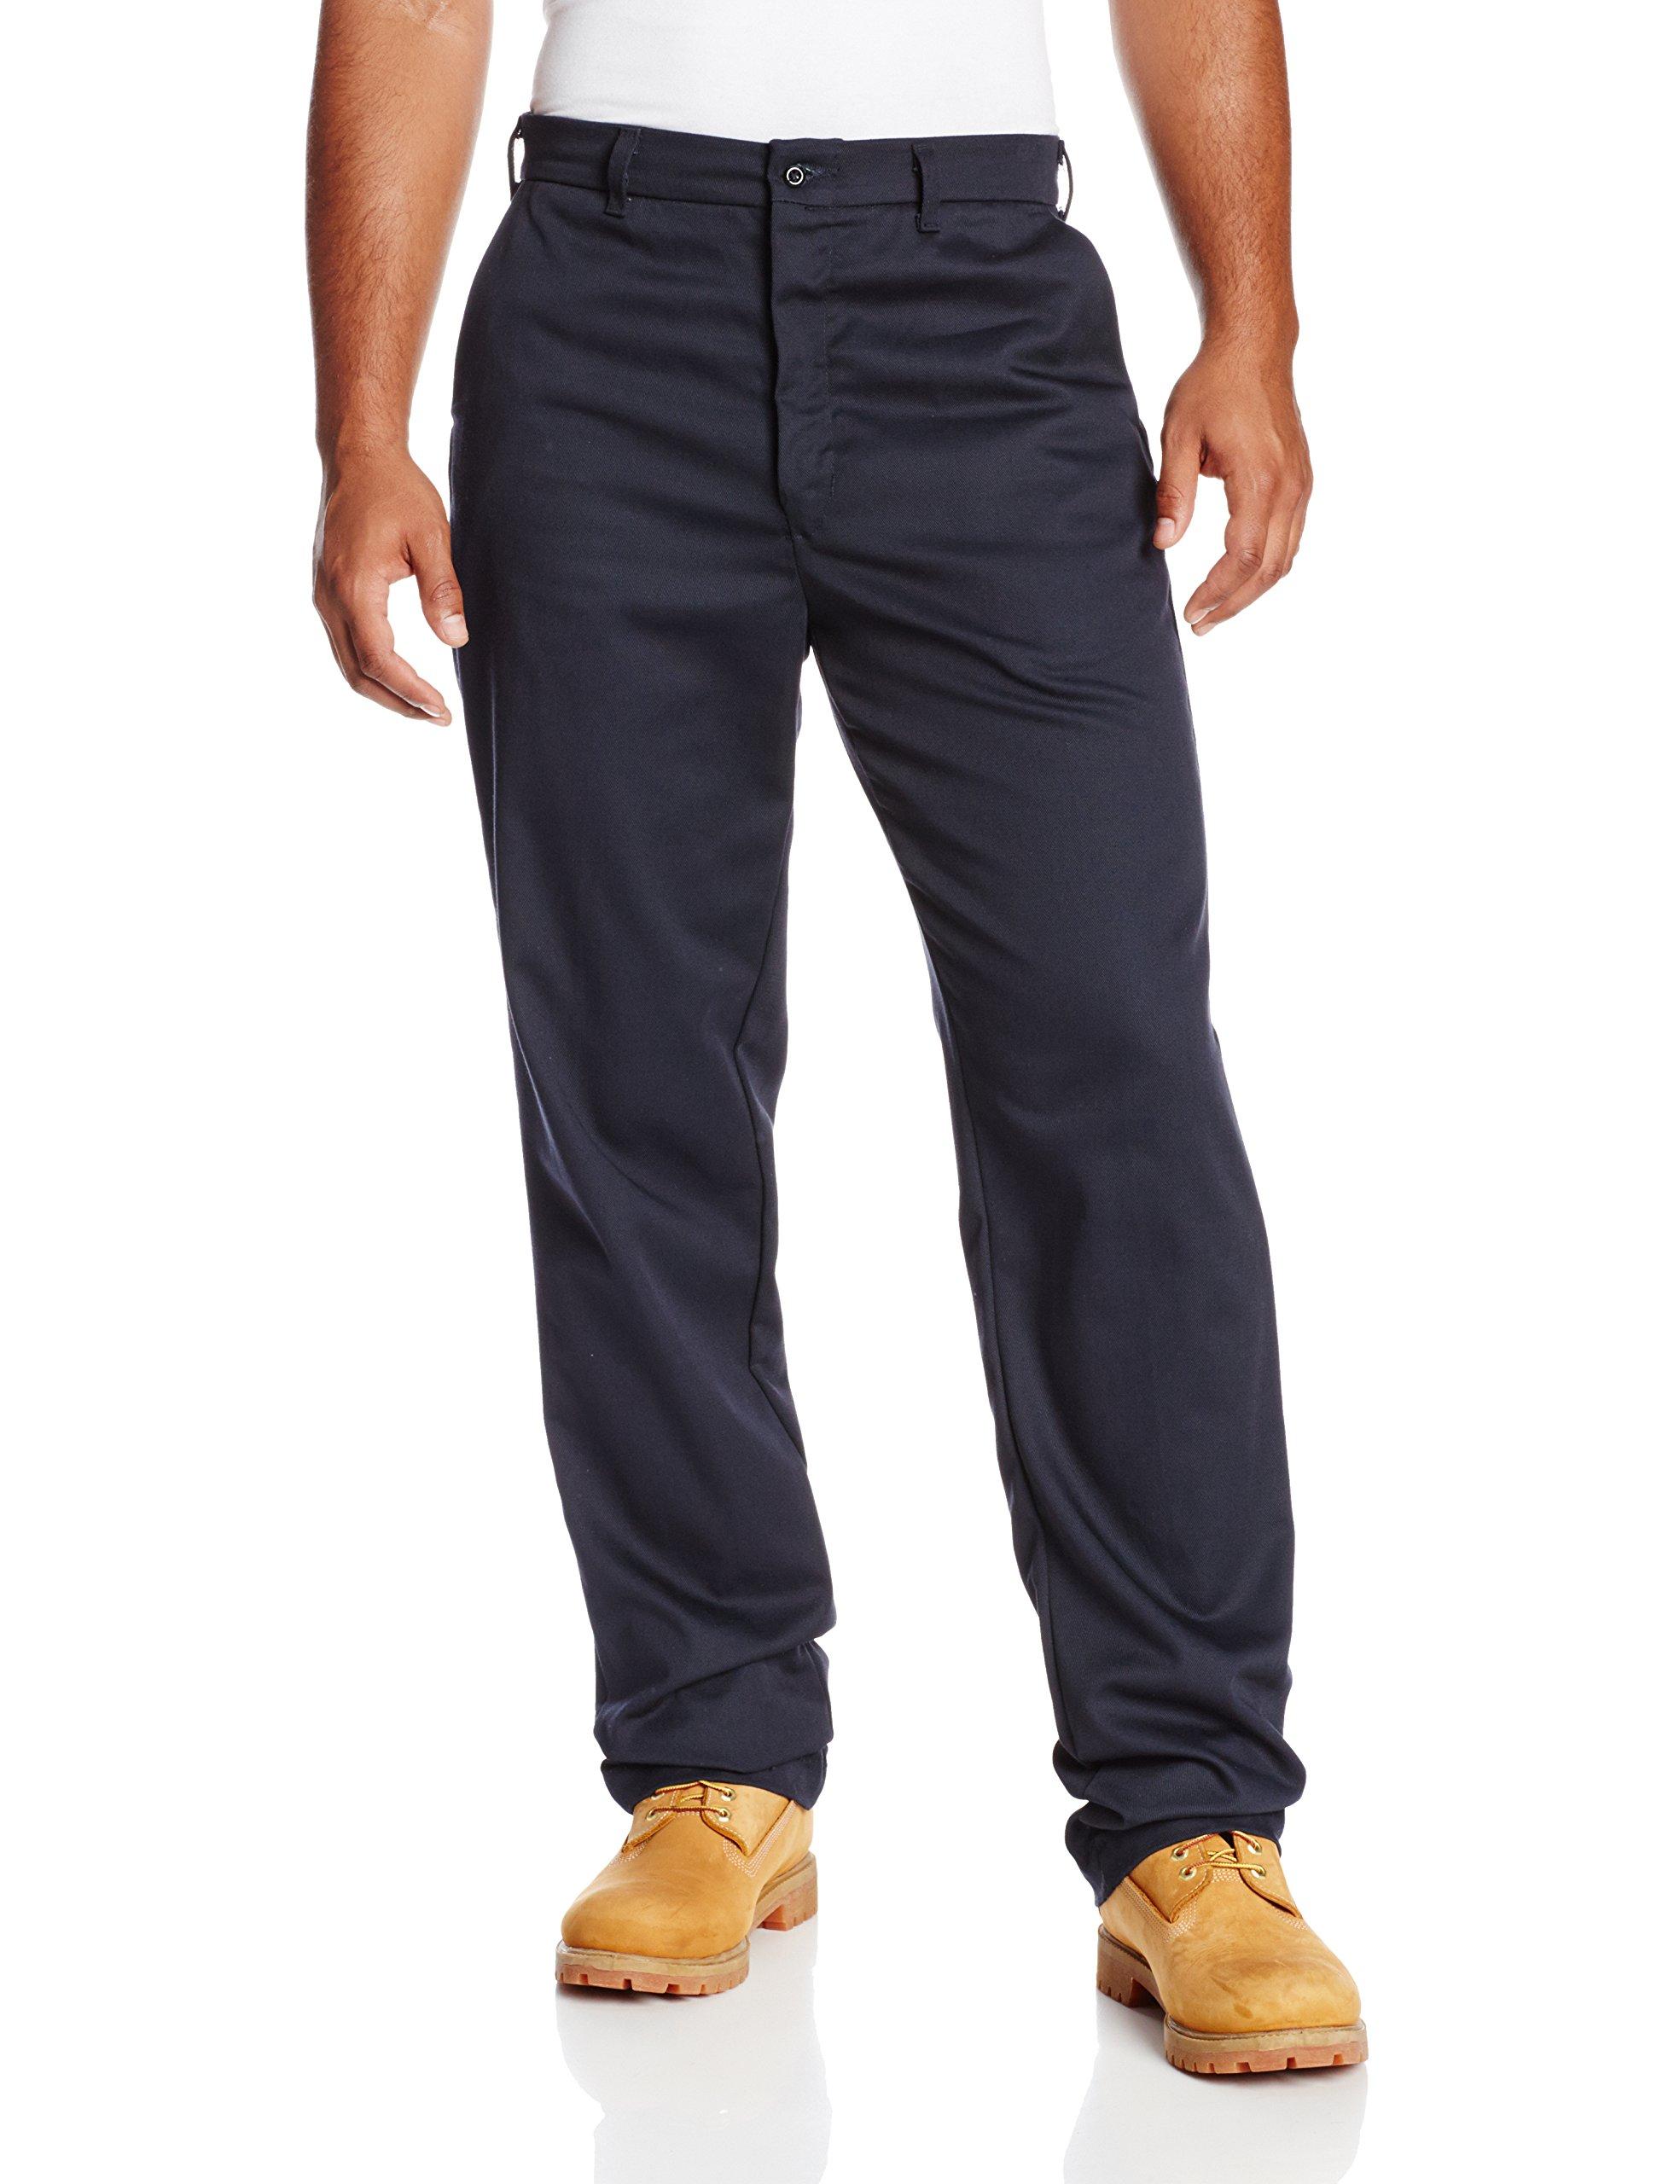 Bulwark Men's Flame Resistant 9 oz Twill Cotton Work Pant, Navy, 38W x 30L